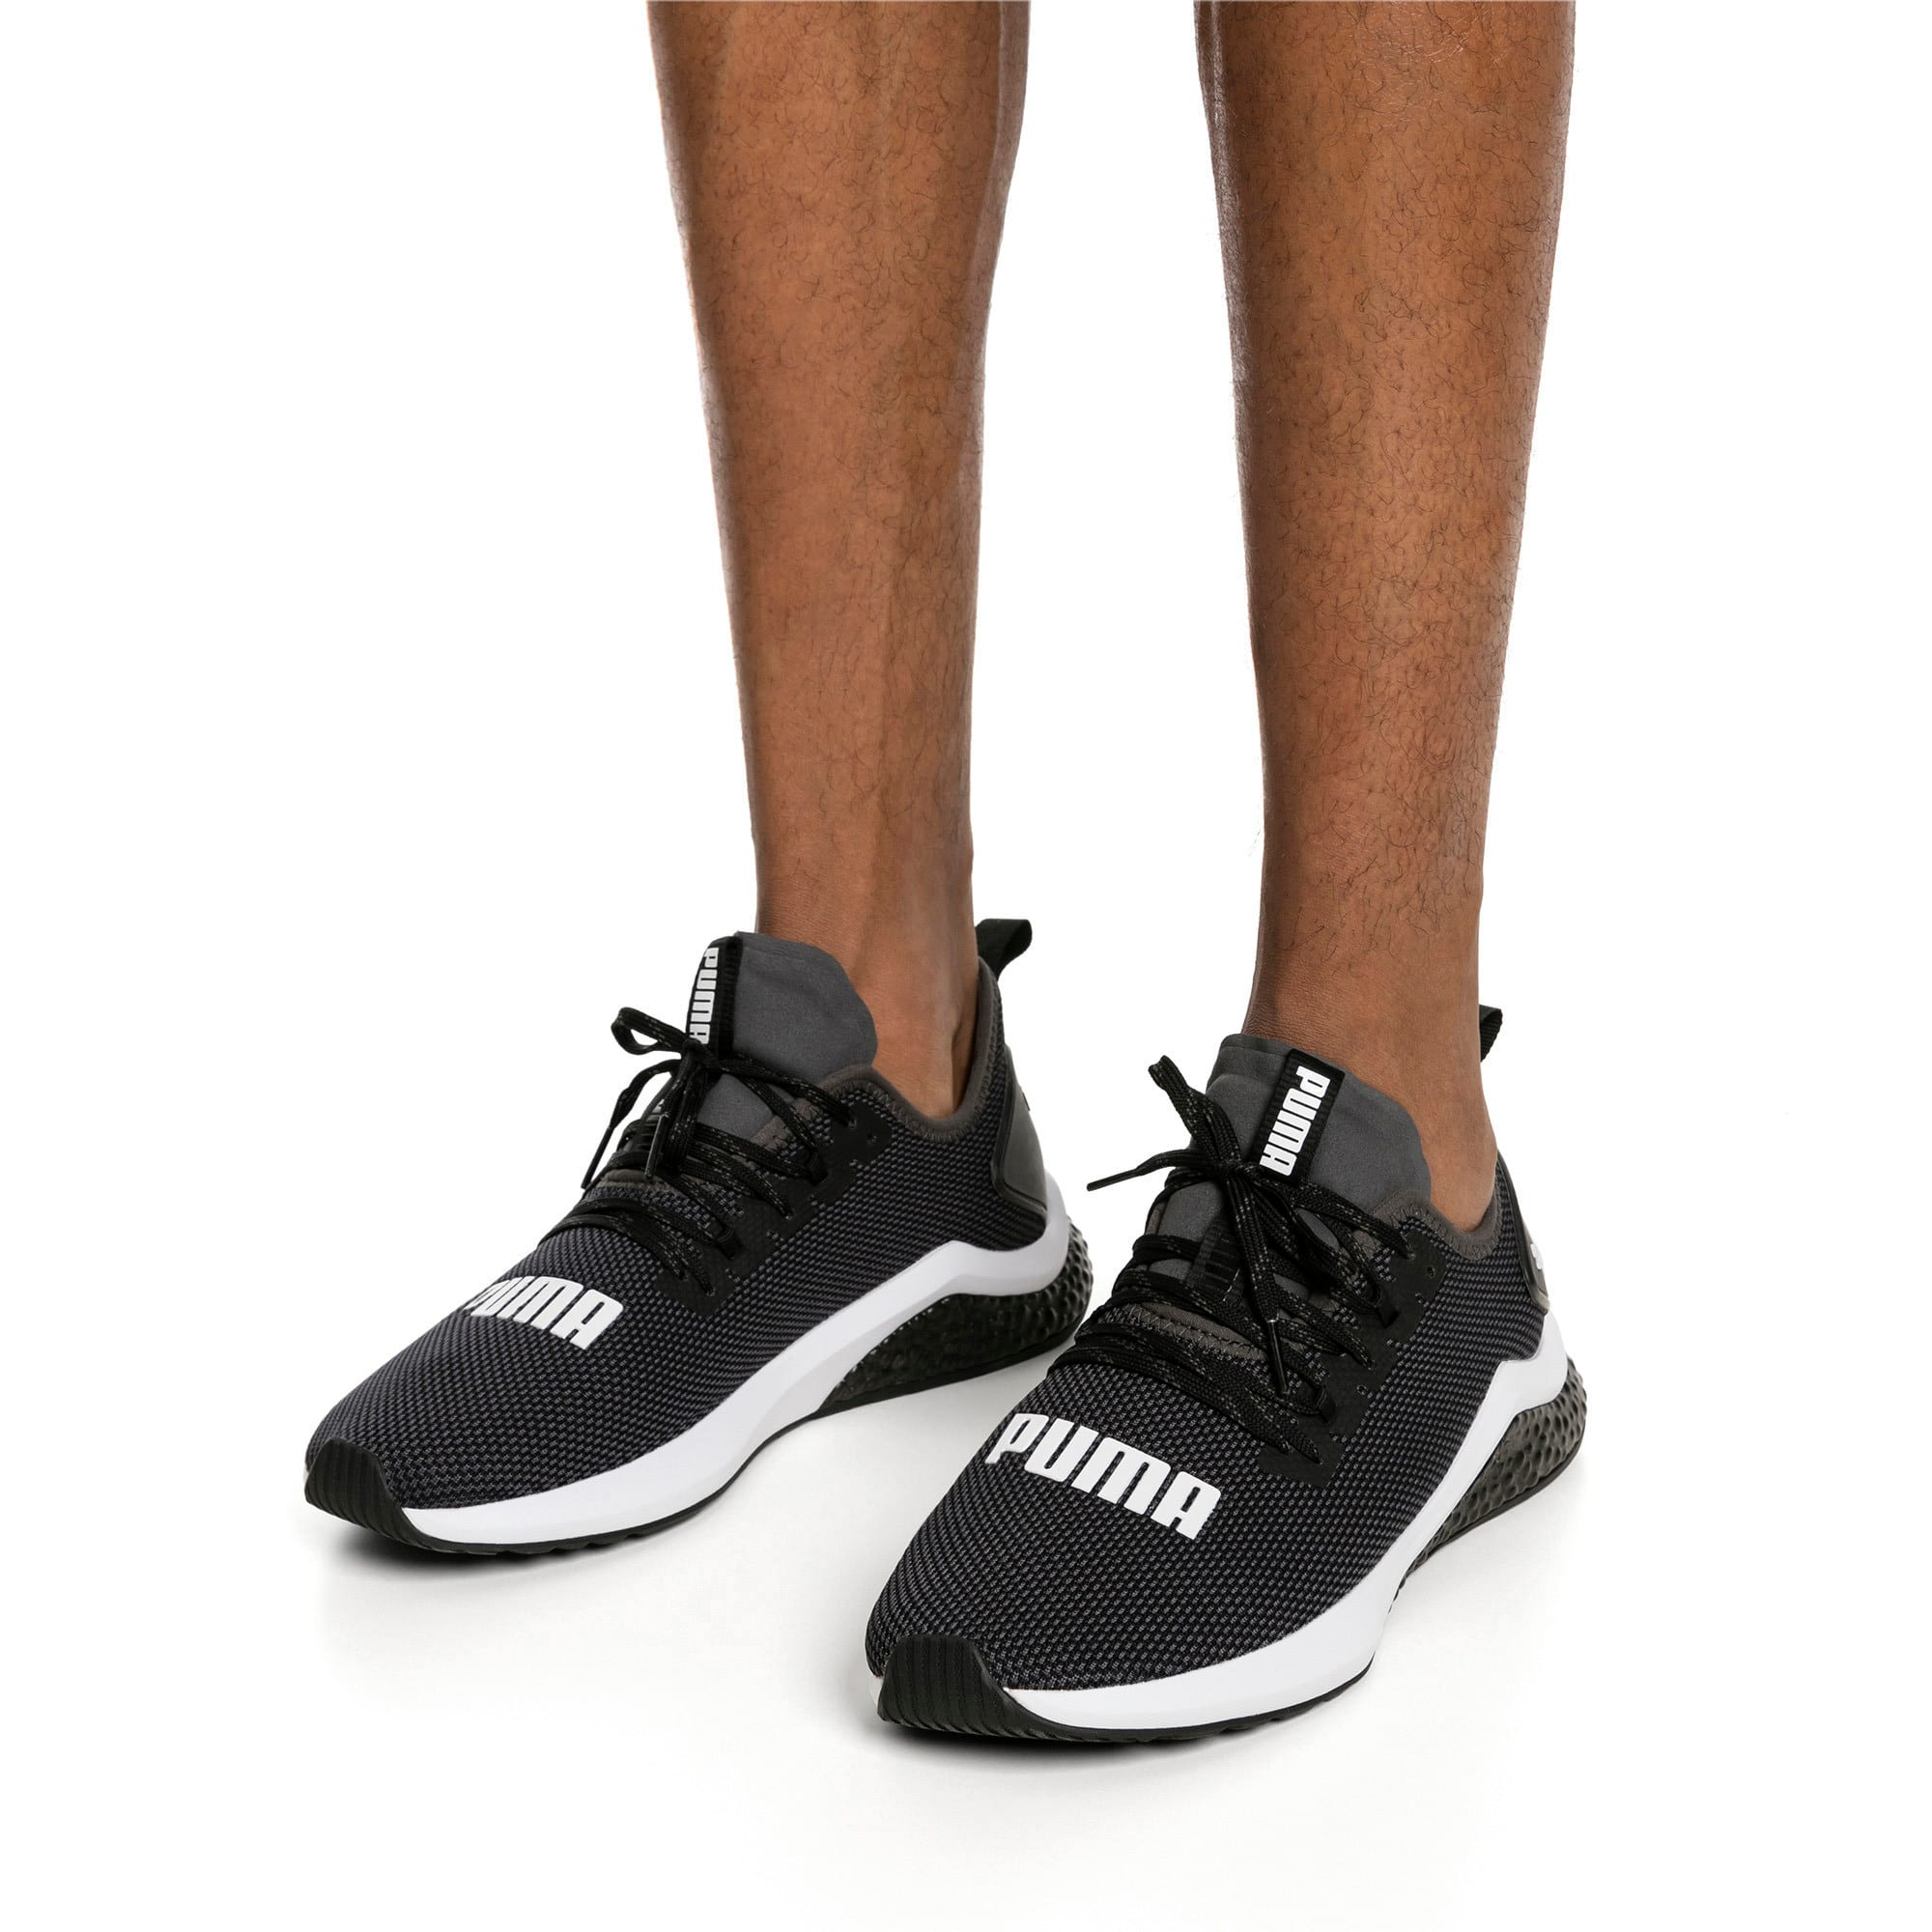 Thumbnail 2 of HYBRID NX Men's Running Shoes, Puma Black-Puma White, medium